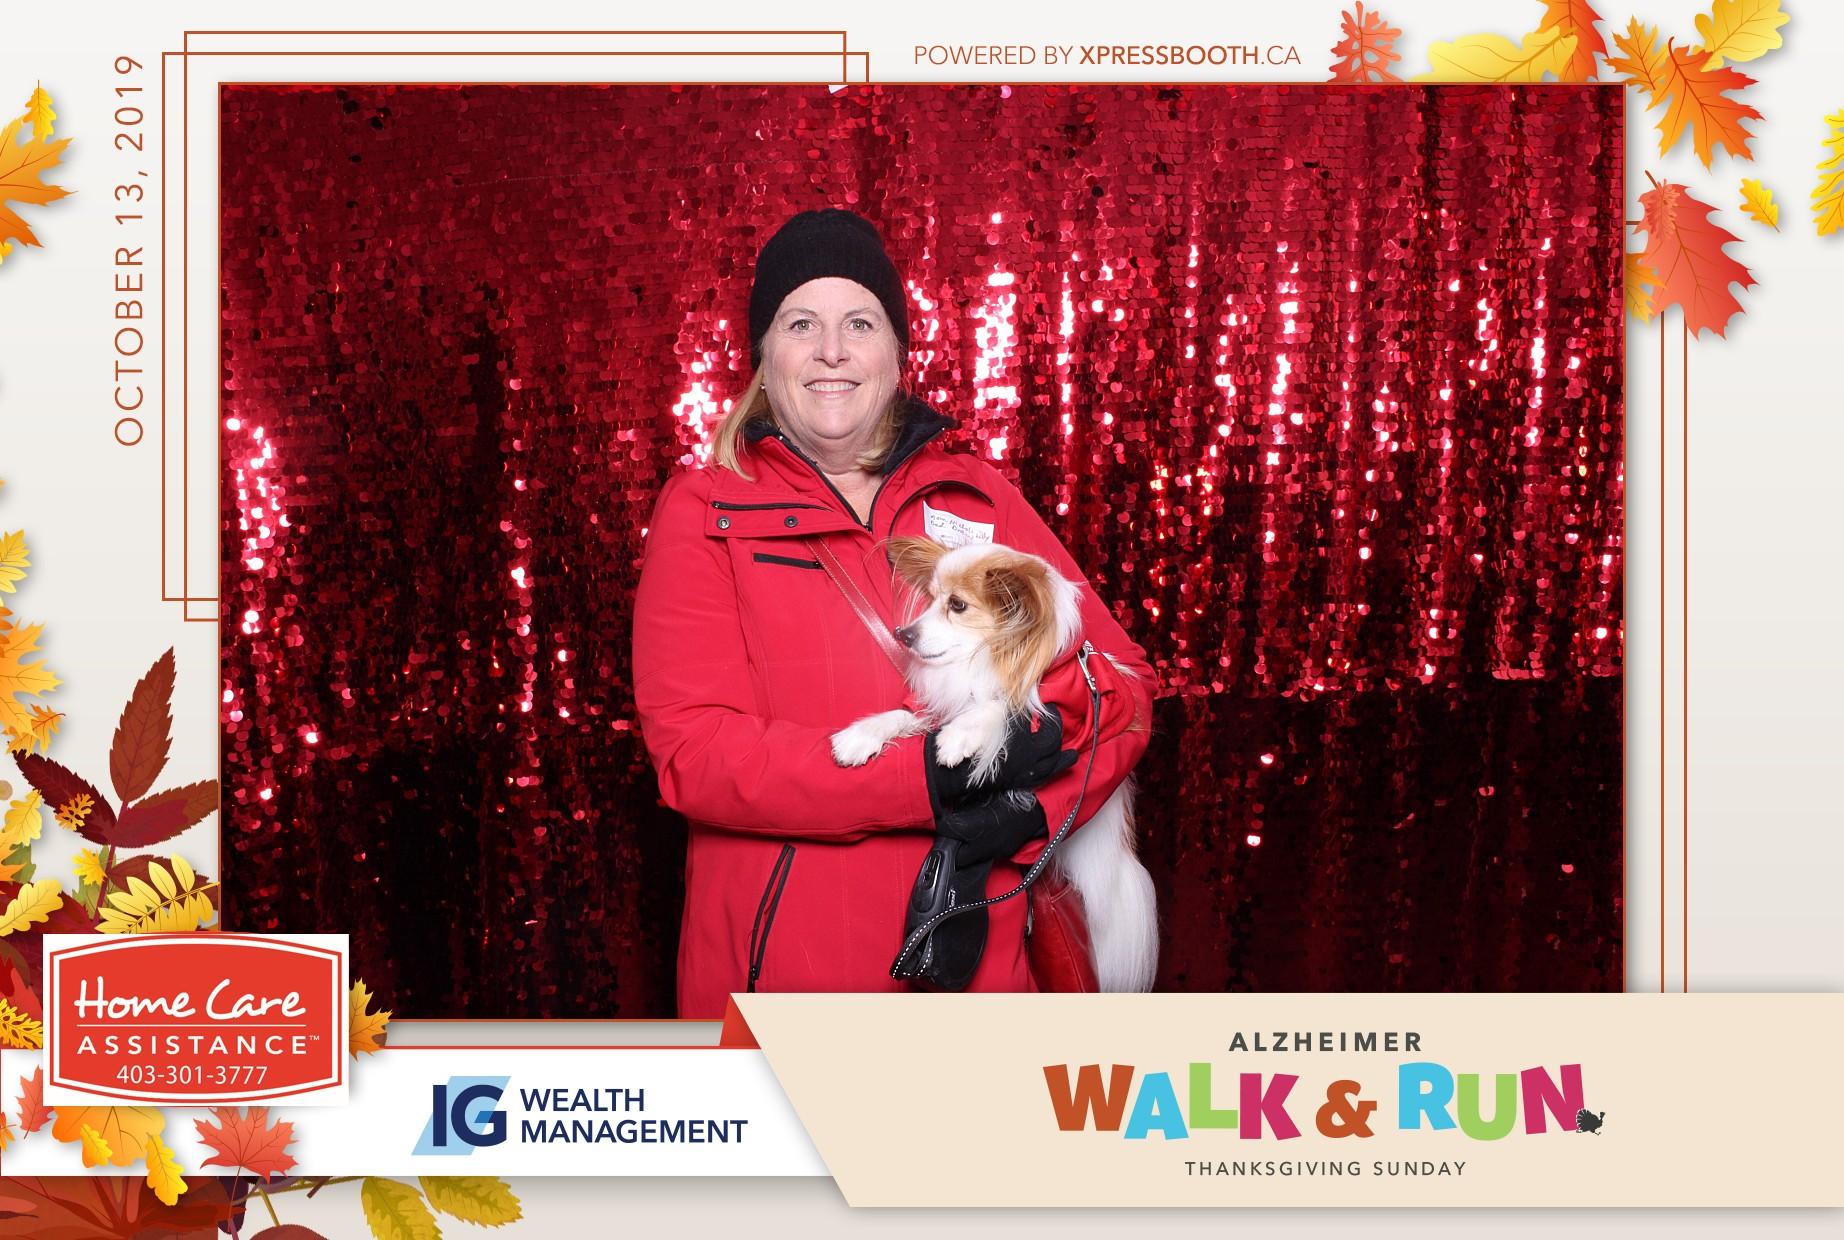 WalkRunAlzheimerSociety-0133-PRINT